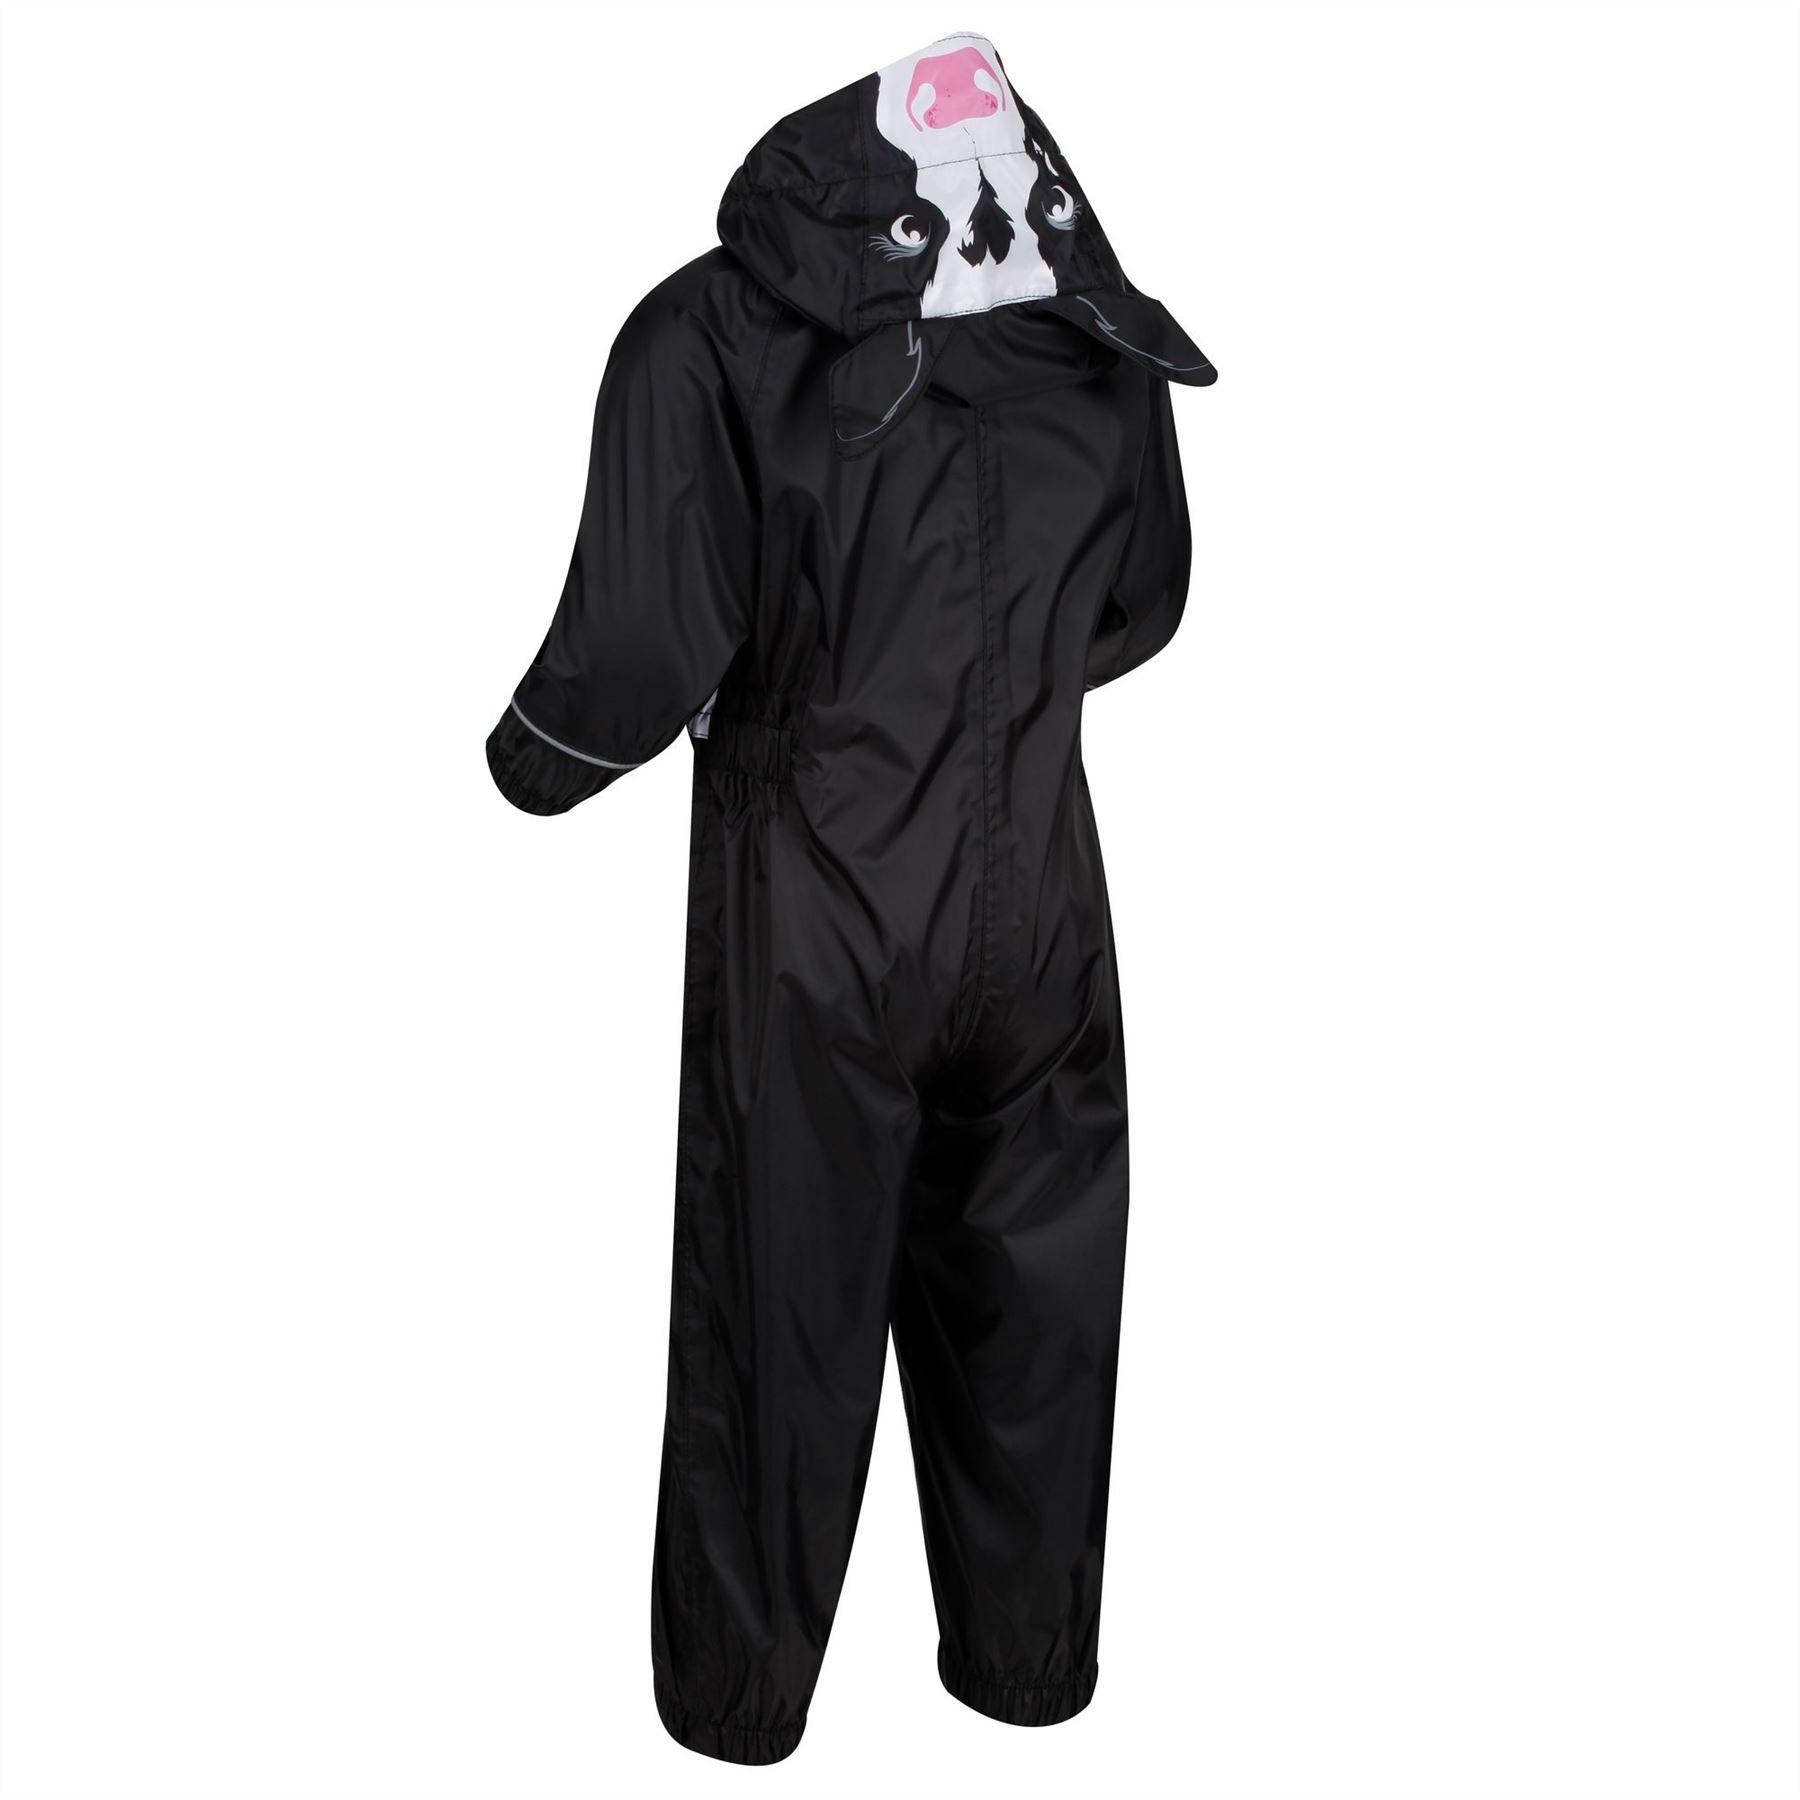 miniatuur 3 - Regatta Kids Charco All in Onezee Waterproof Puddle Suit Animal style Boys Girls